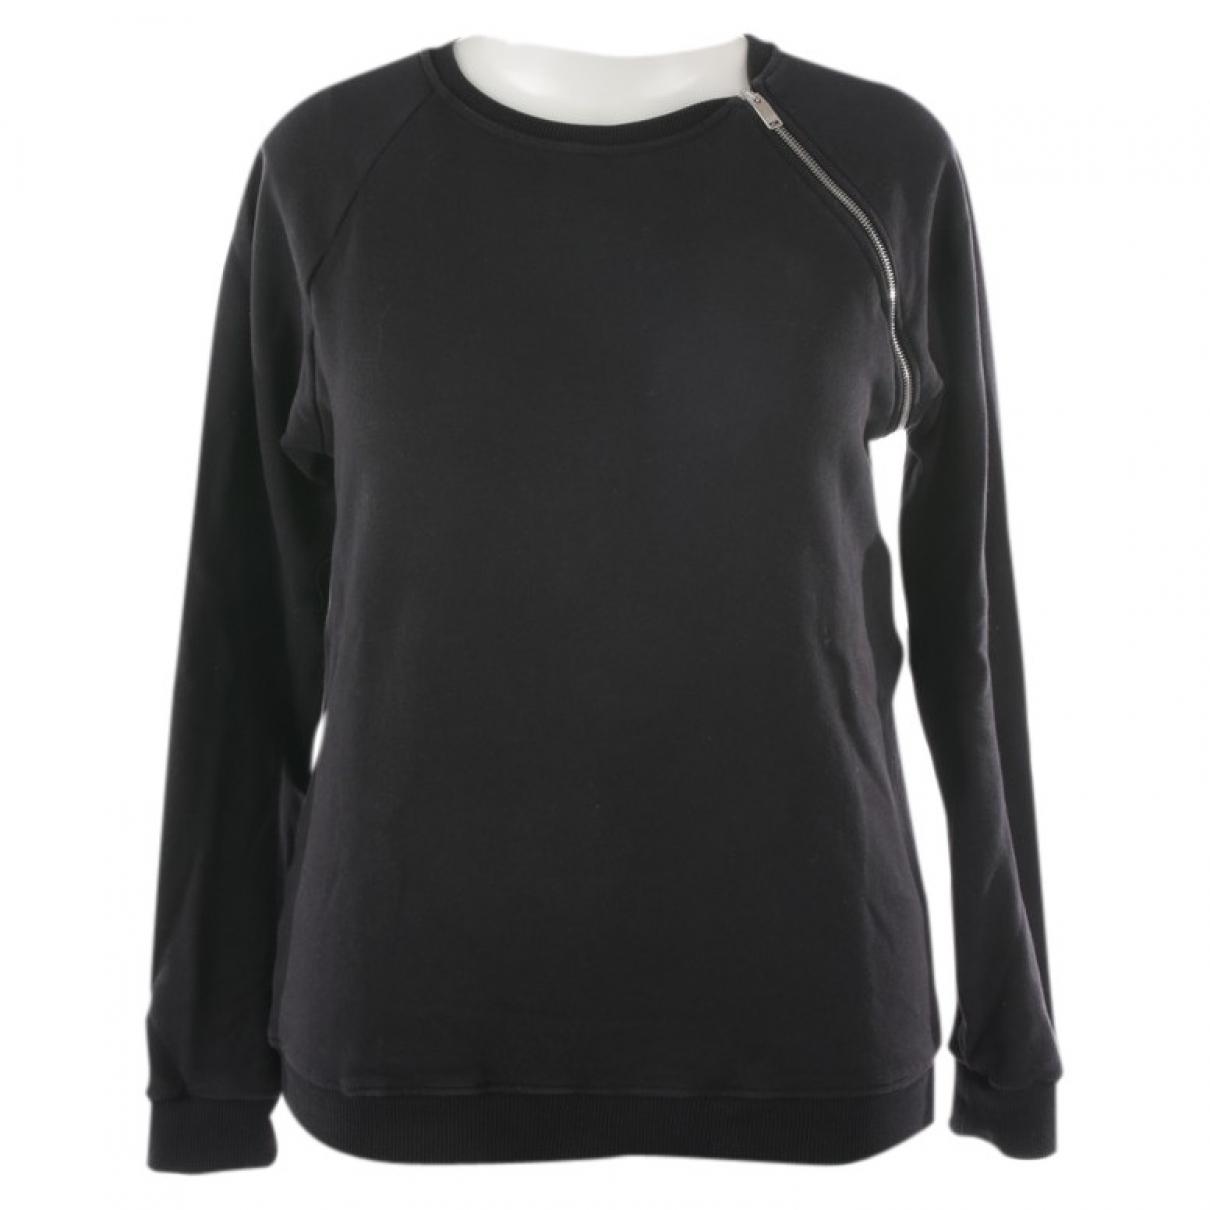 Saint Laurent N Black Cotton Knitwear for Women L International